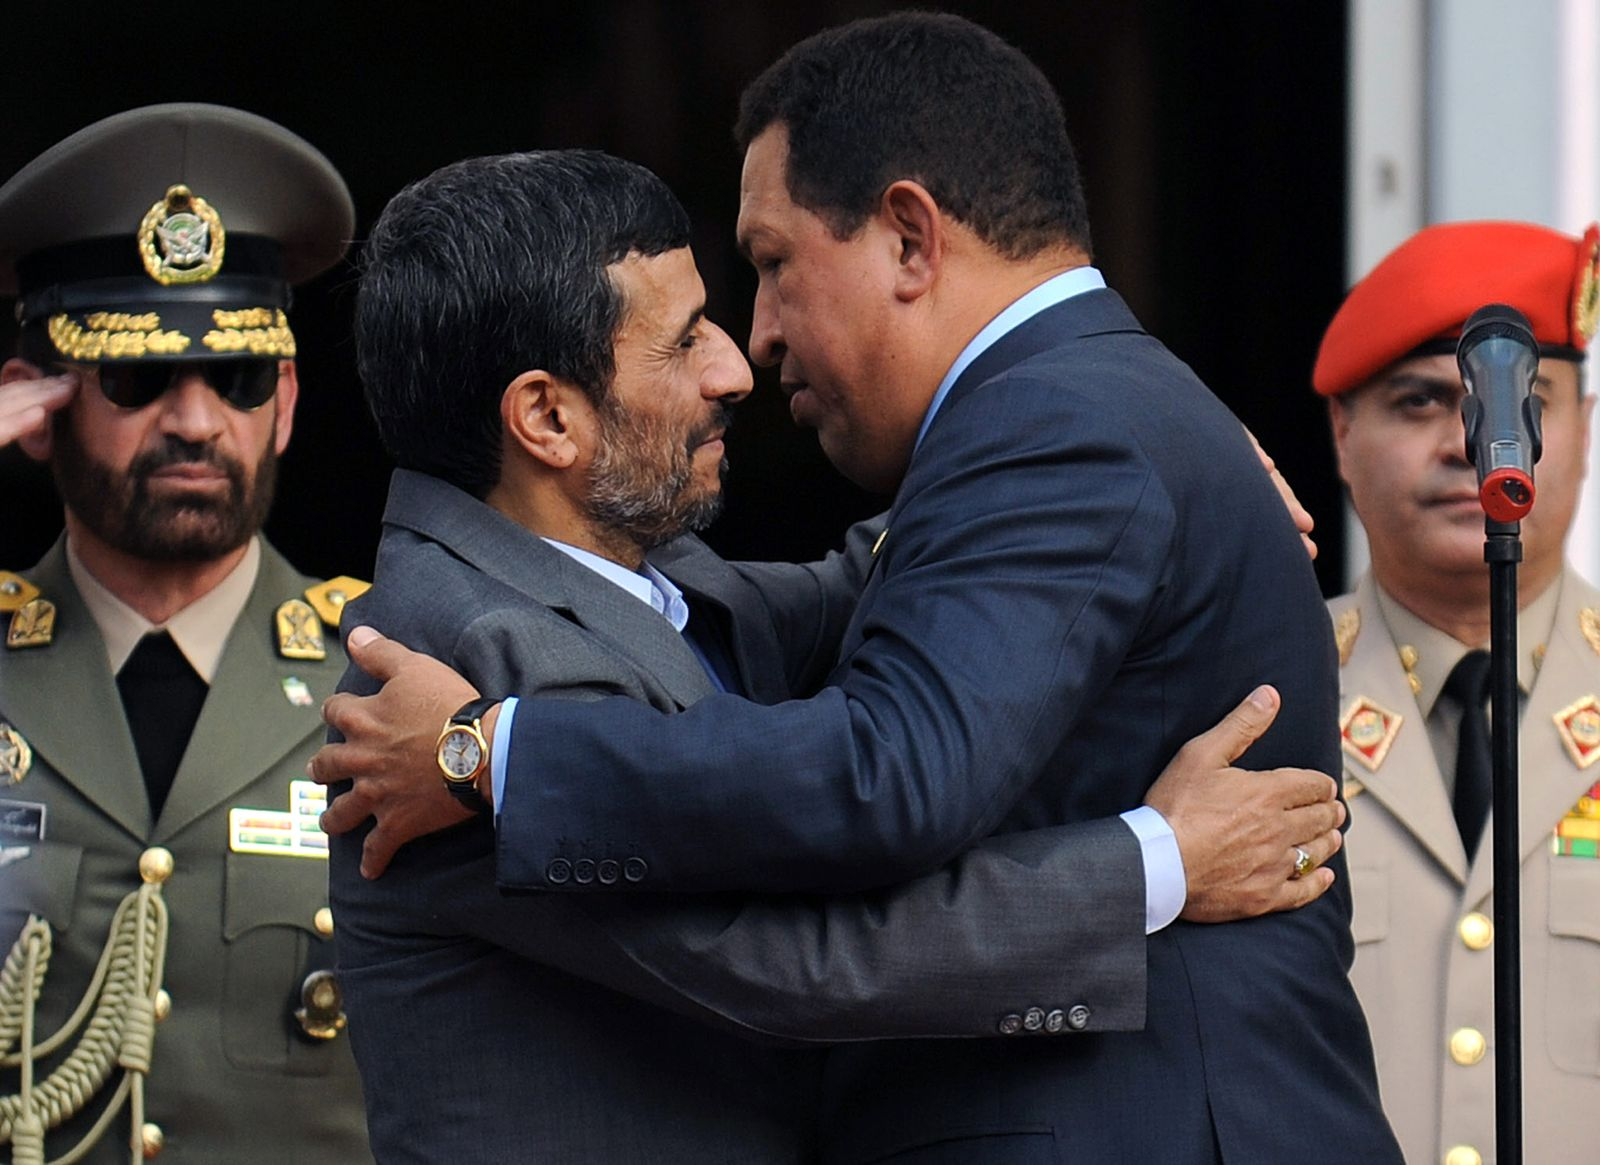 Ahmadinedschad/ Chavez